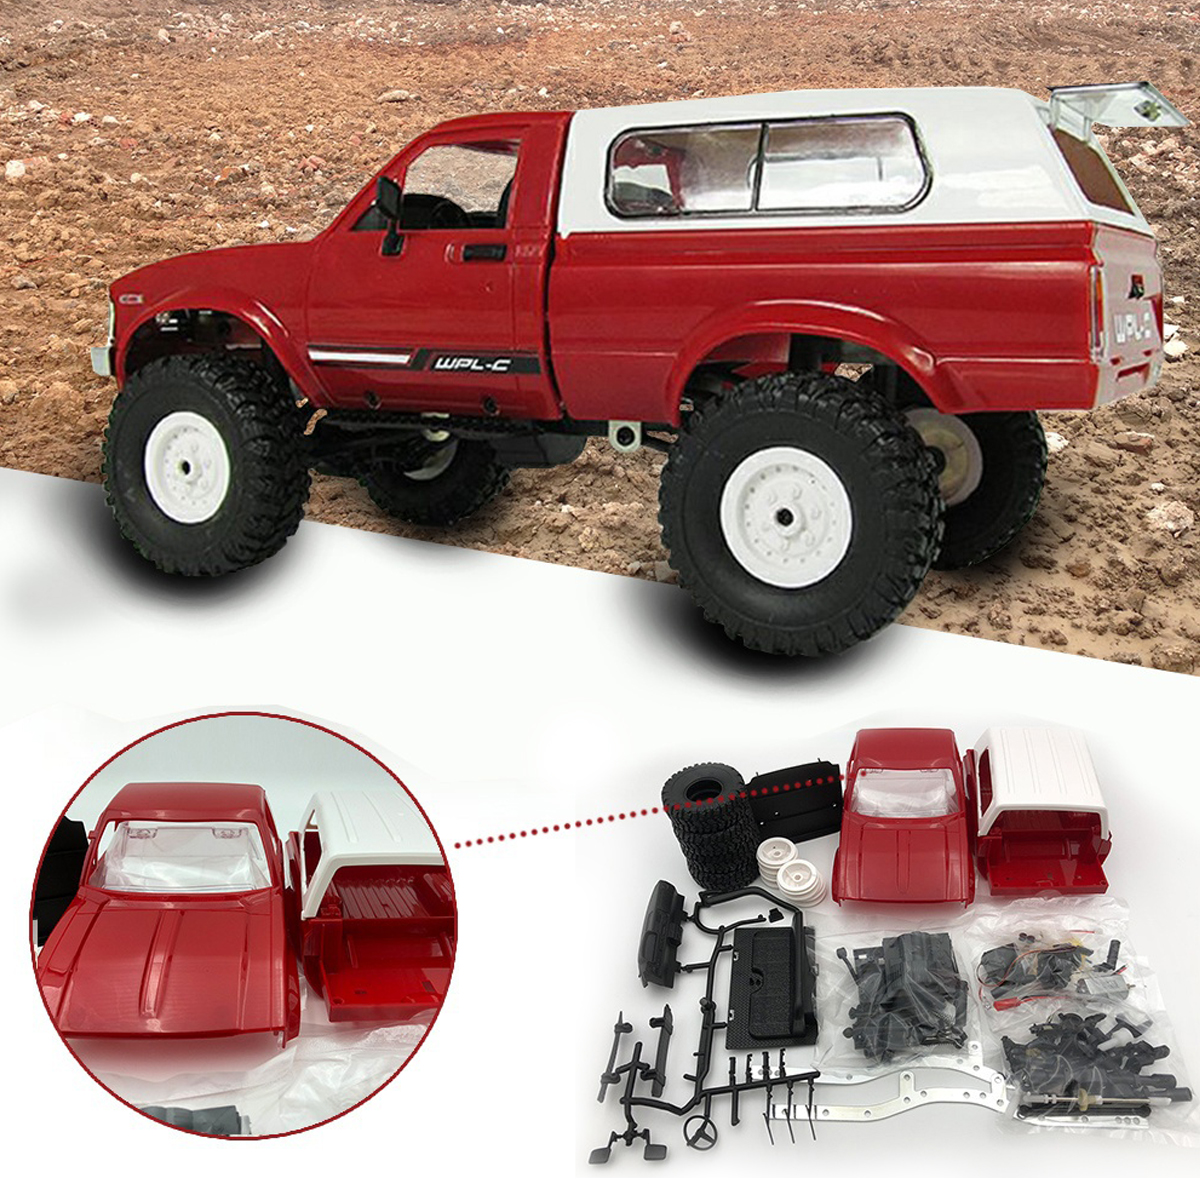 Remote Control Truck DIY Kit C 24 1:16 2.4G 4WD Off Road Rock RC Car Kid Toy Red/Blue Drive Lights High Strength Plastics Light